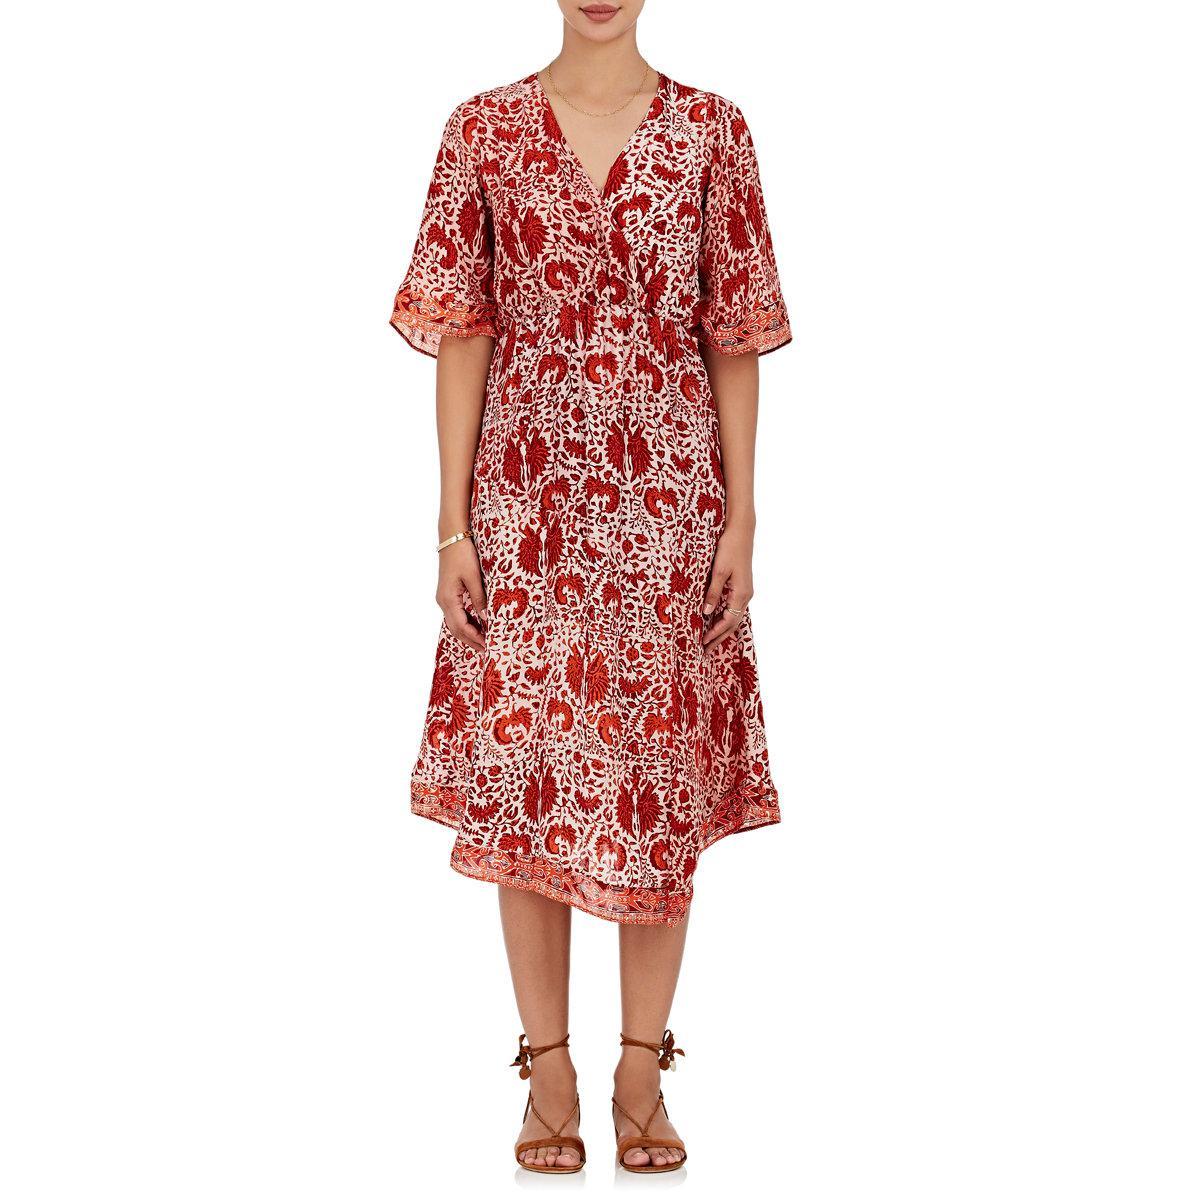 5349c199346 Lyst - Natalie Martin Coco Floral Silk Midi in Orange